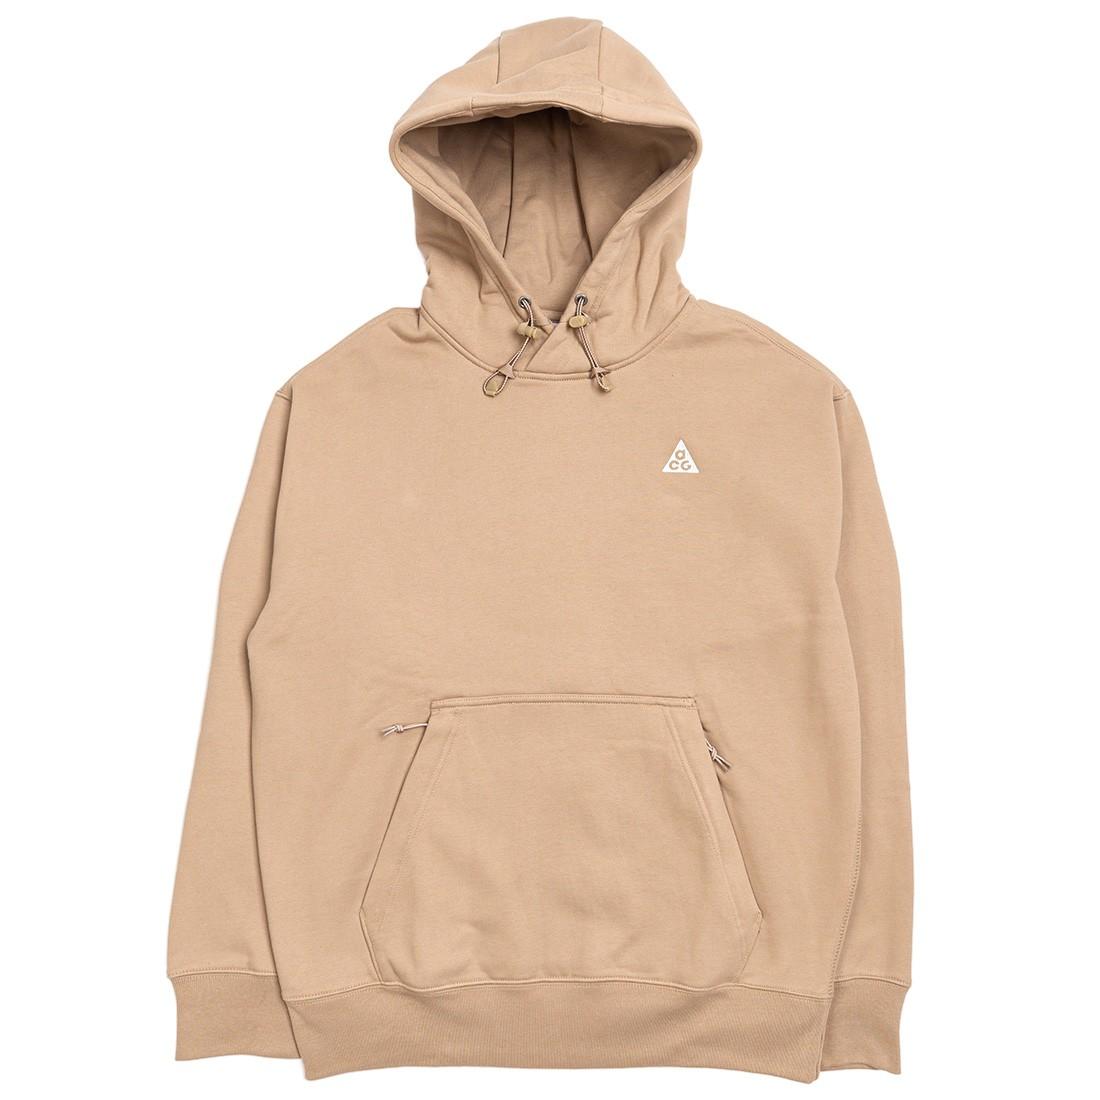 Nike Men Acg Pullover Fleece Hoody (khaki / summit white)